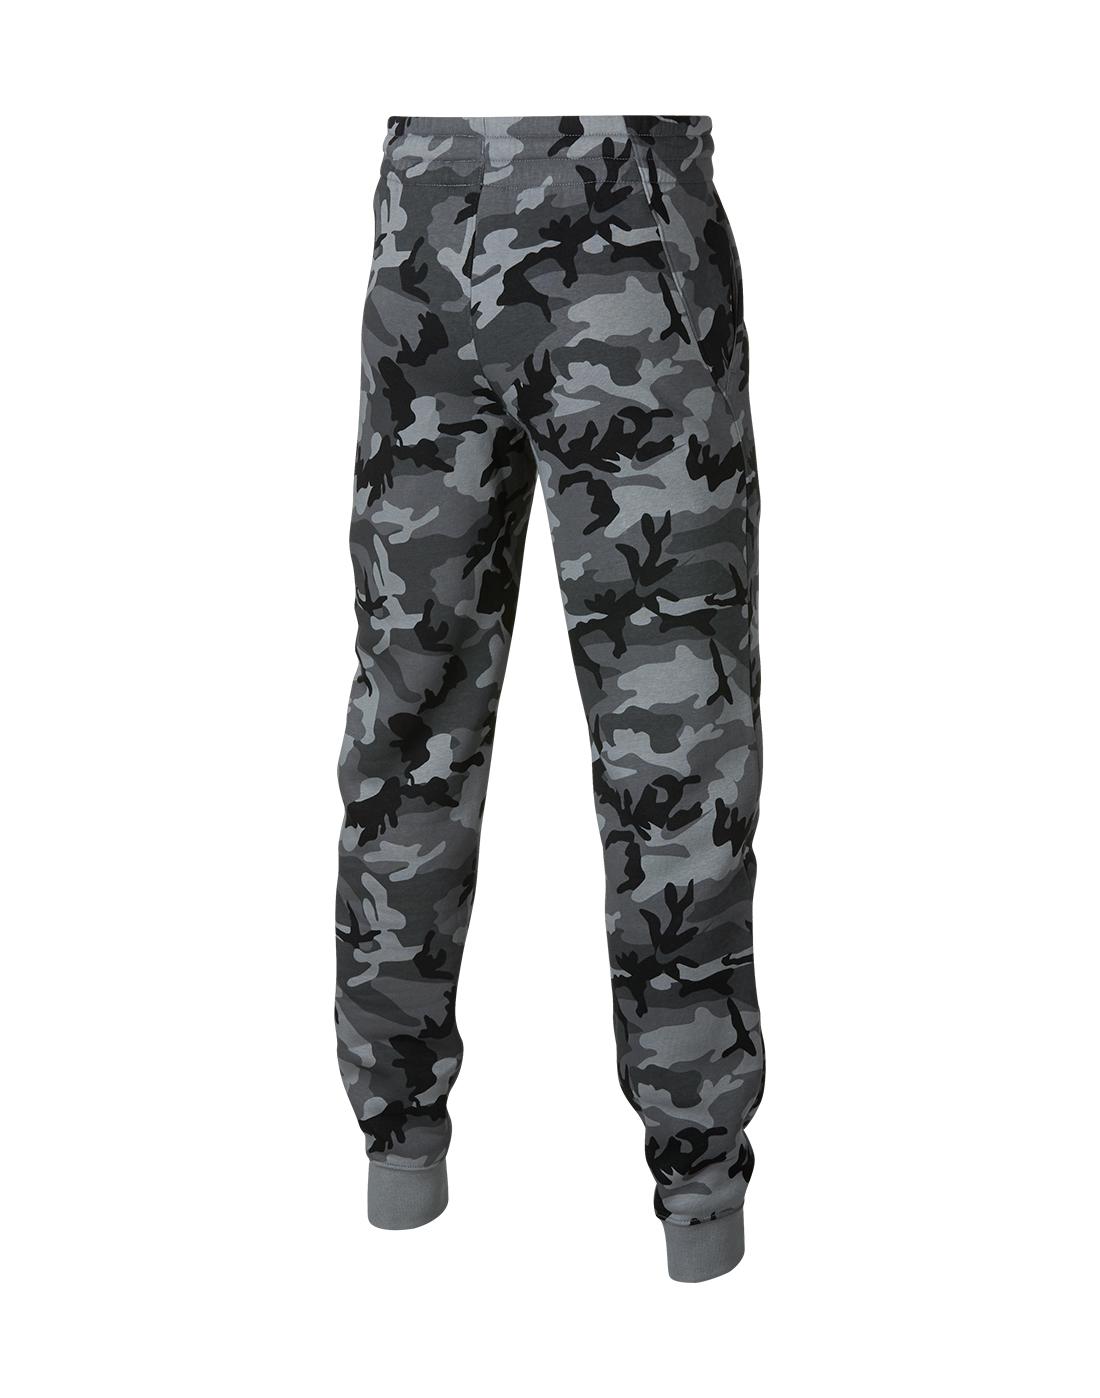 1fc4adc0b28f Older Boys Fleece Camo Pant · Older Boys Fleece Camo Pant